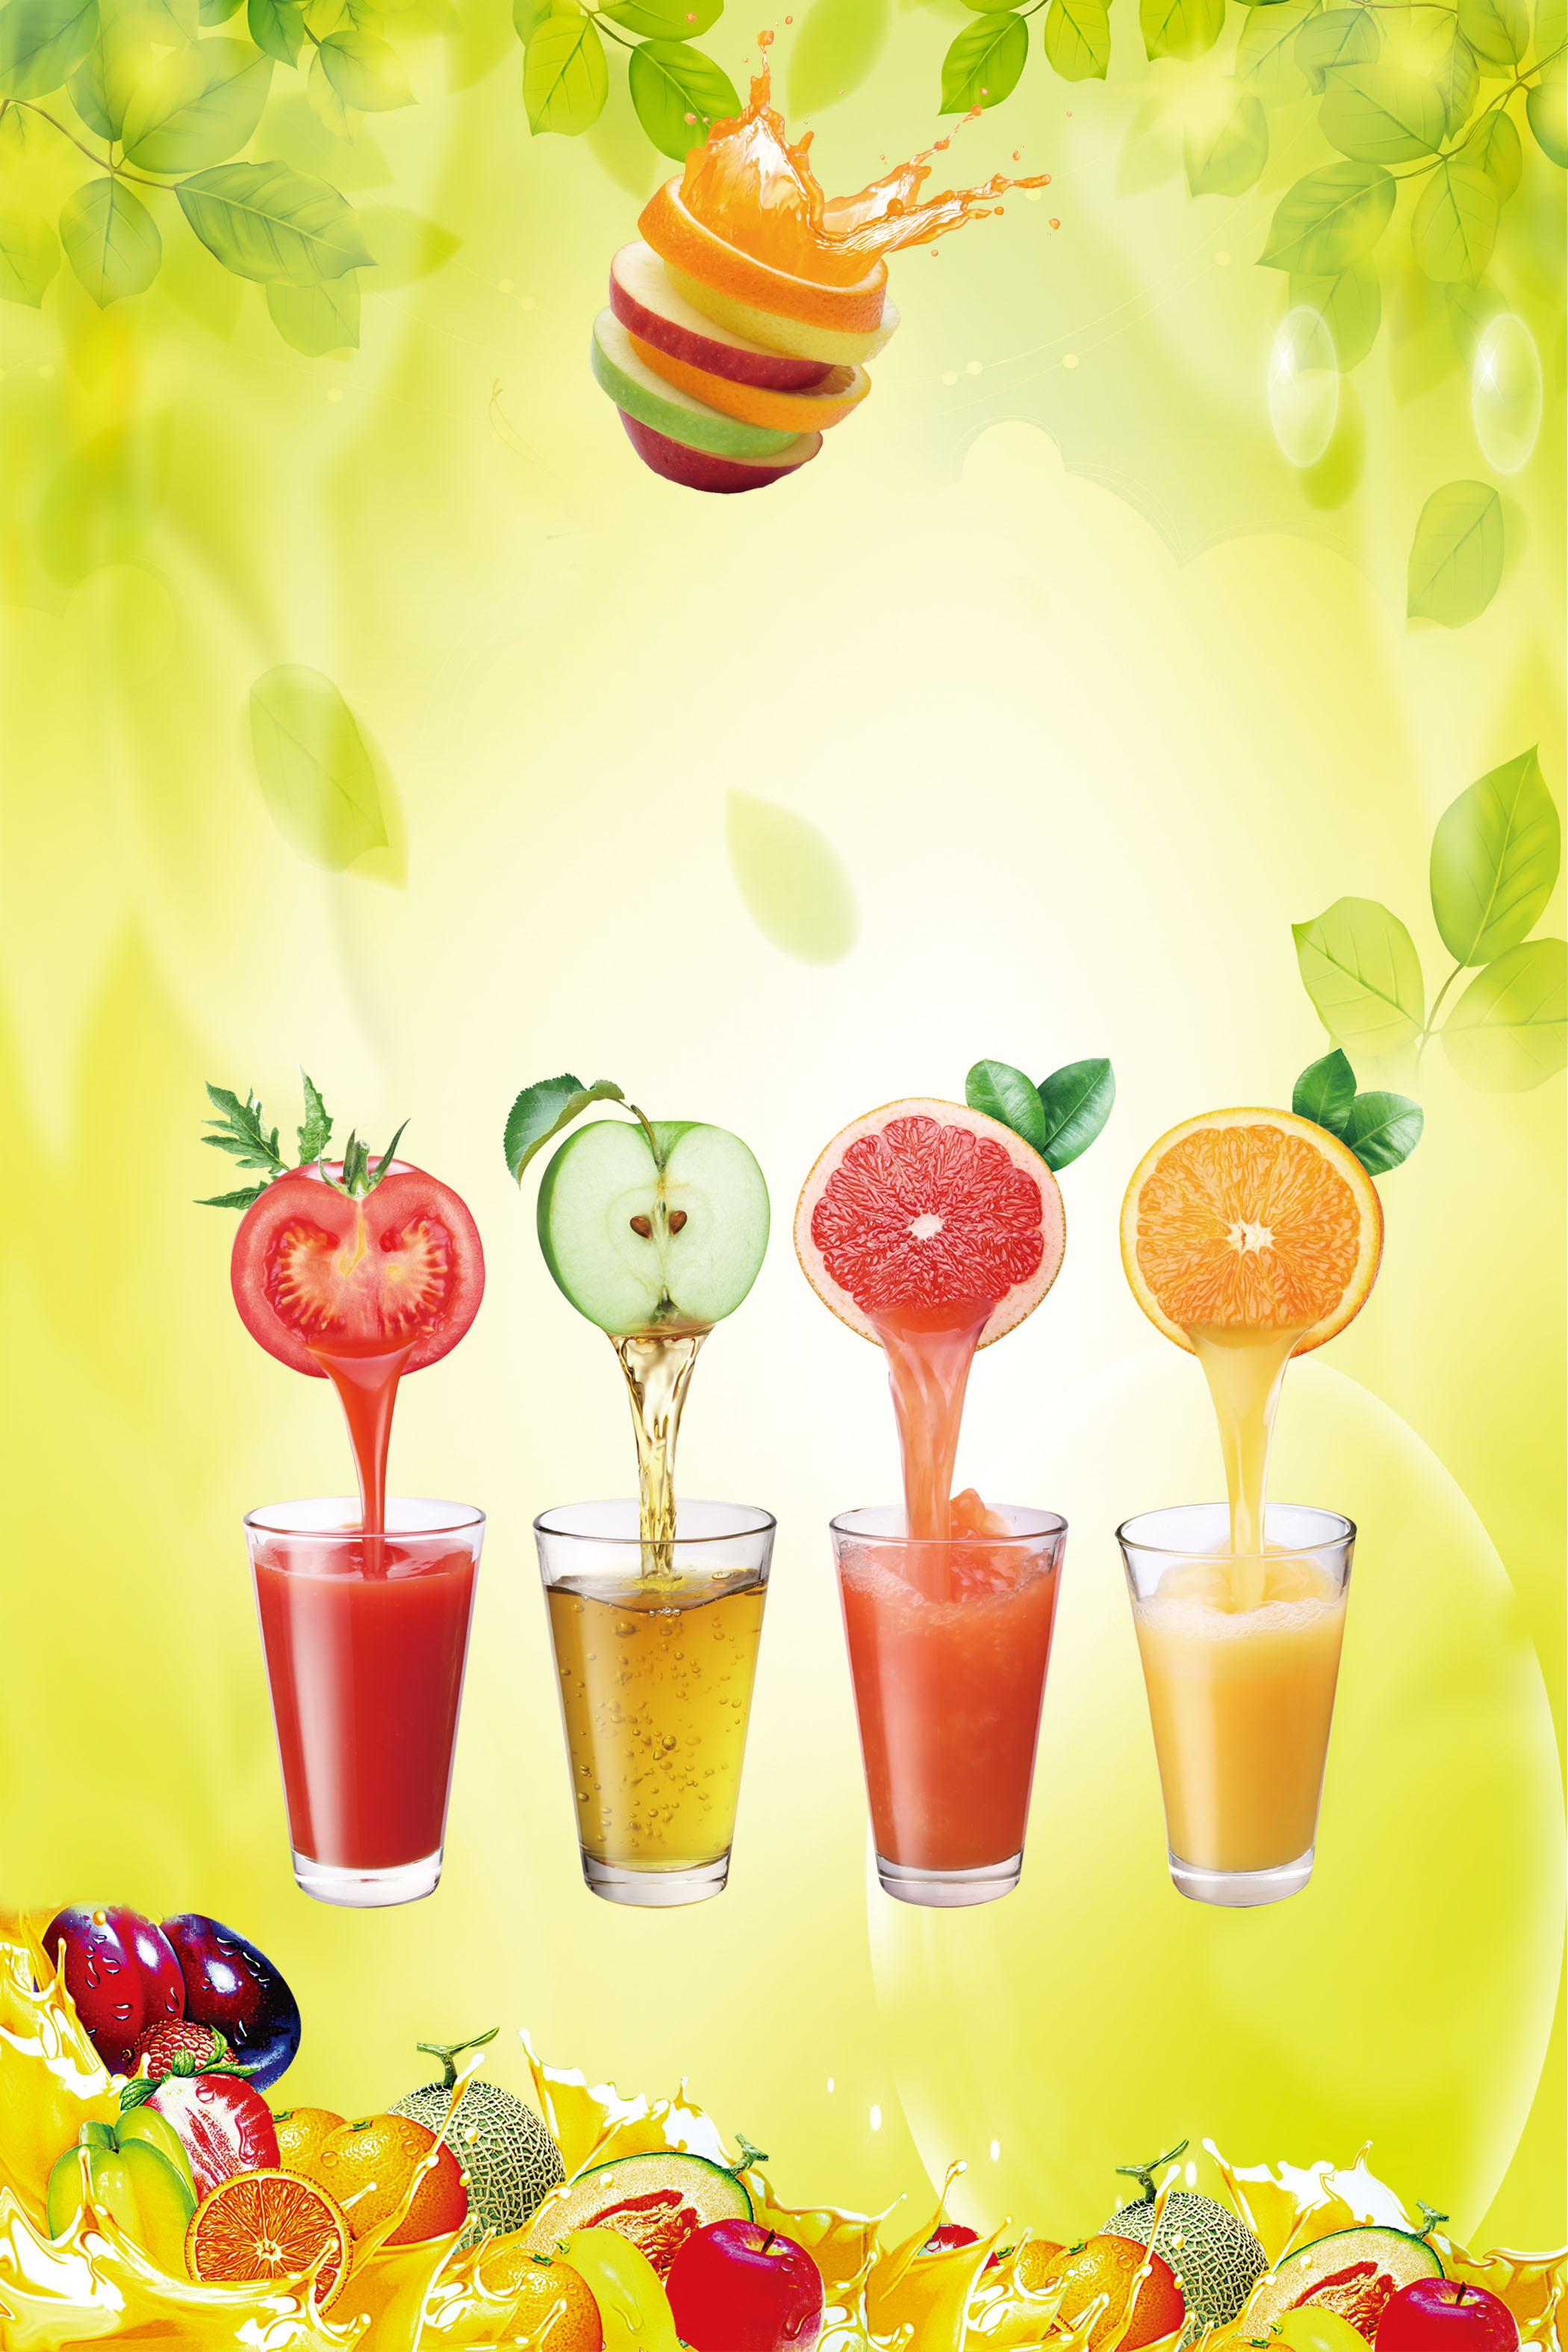 verre verre l u0026 39 alcool cocktail contexte jus de fruits les